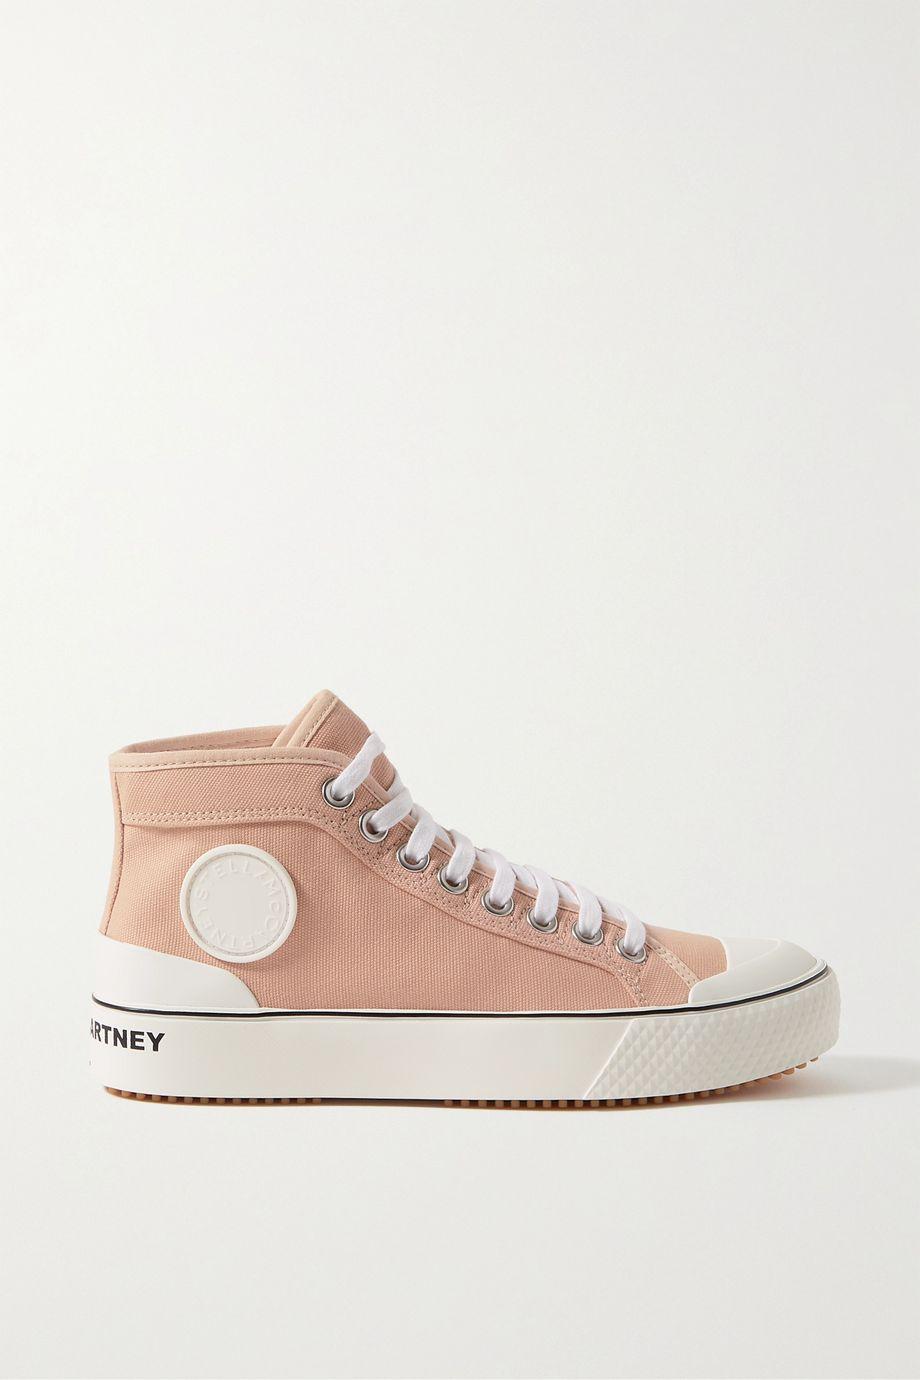 Stella McCartney Canvas high-top sneakers